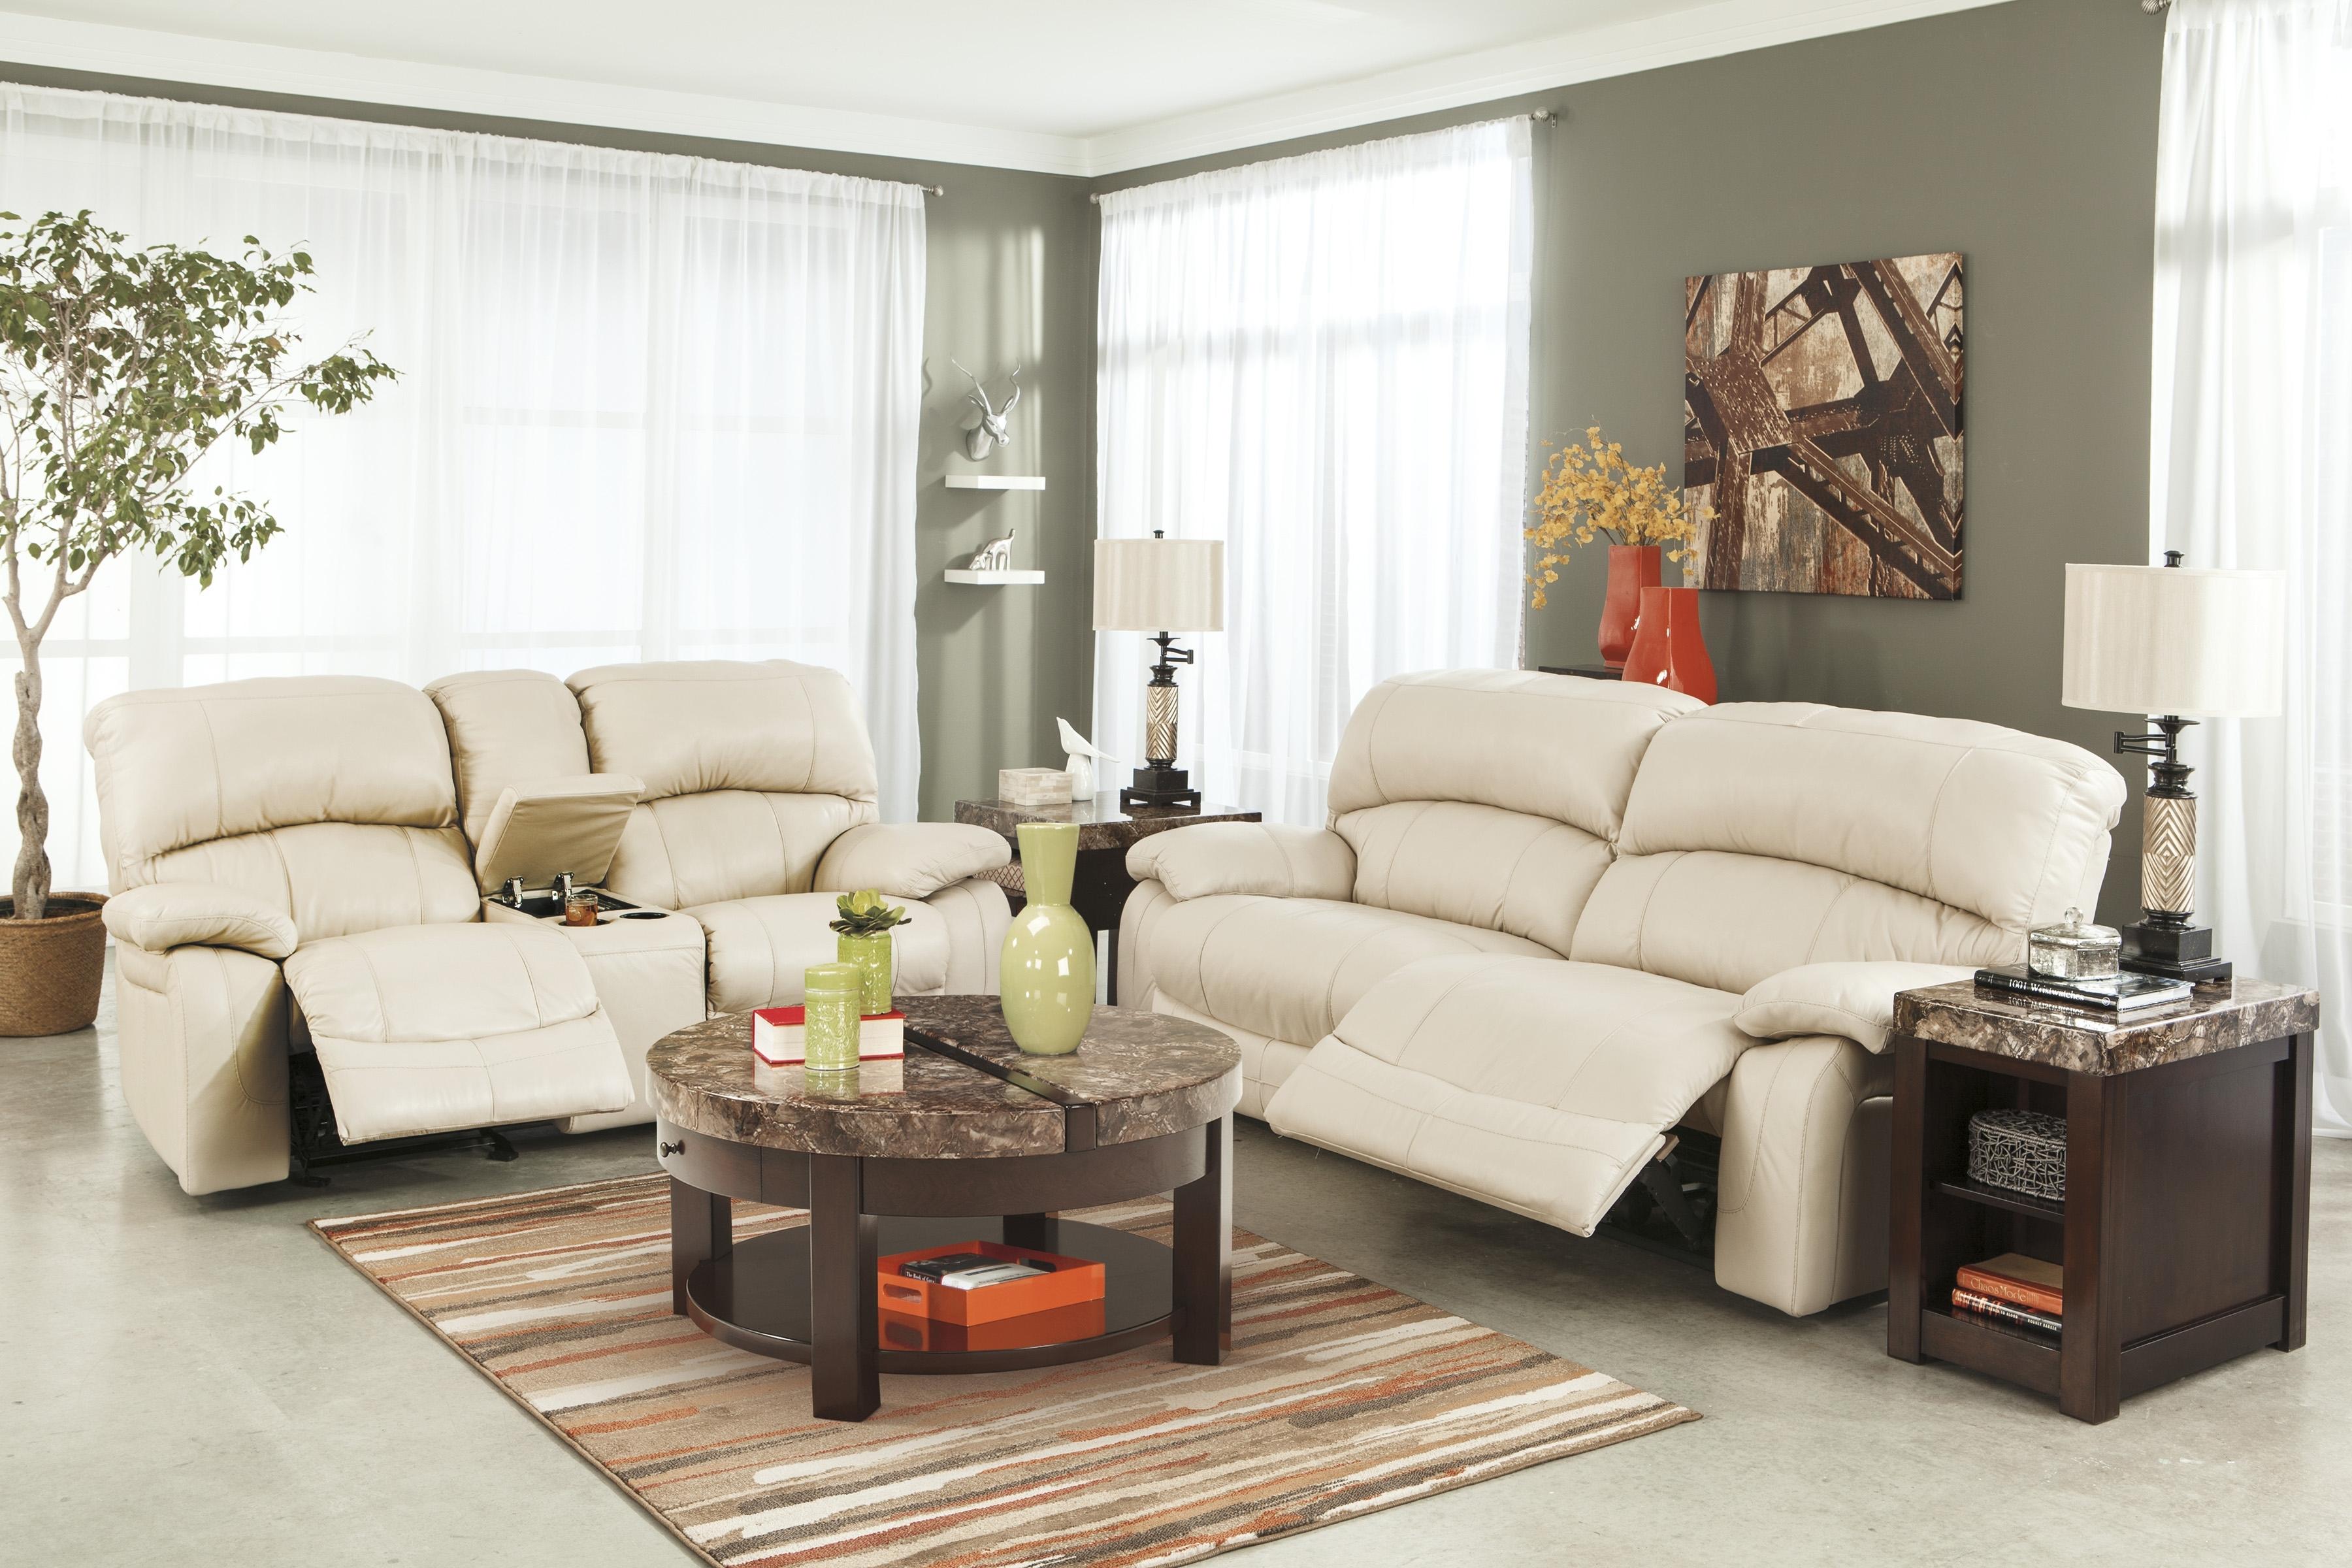 Cream Colored Sofa (View 4 of 15)